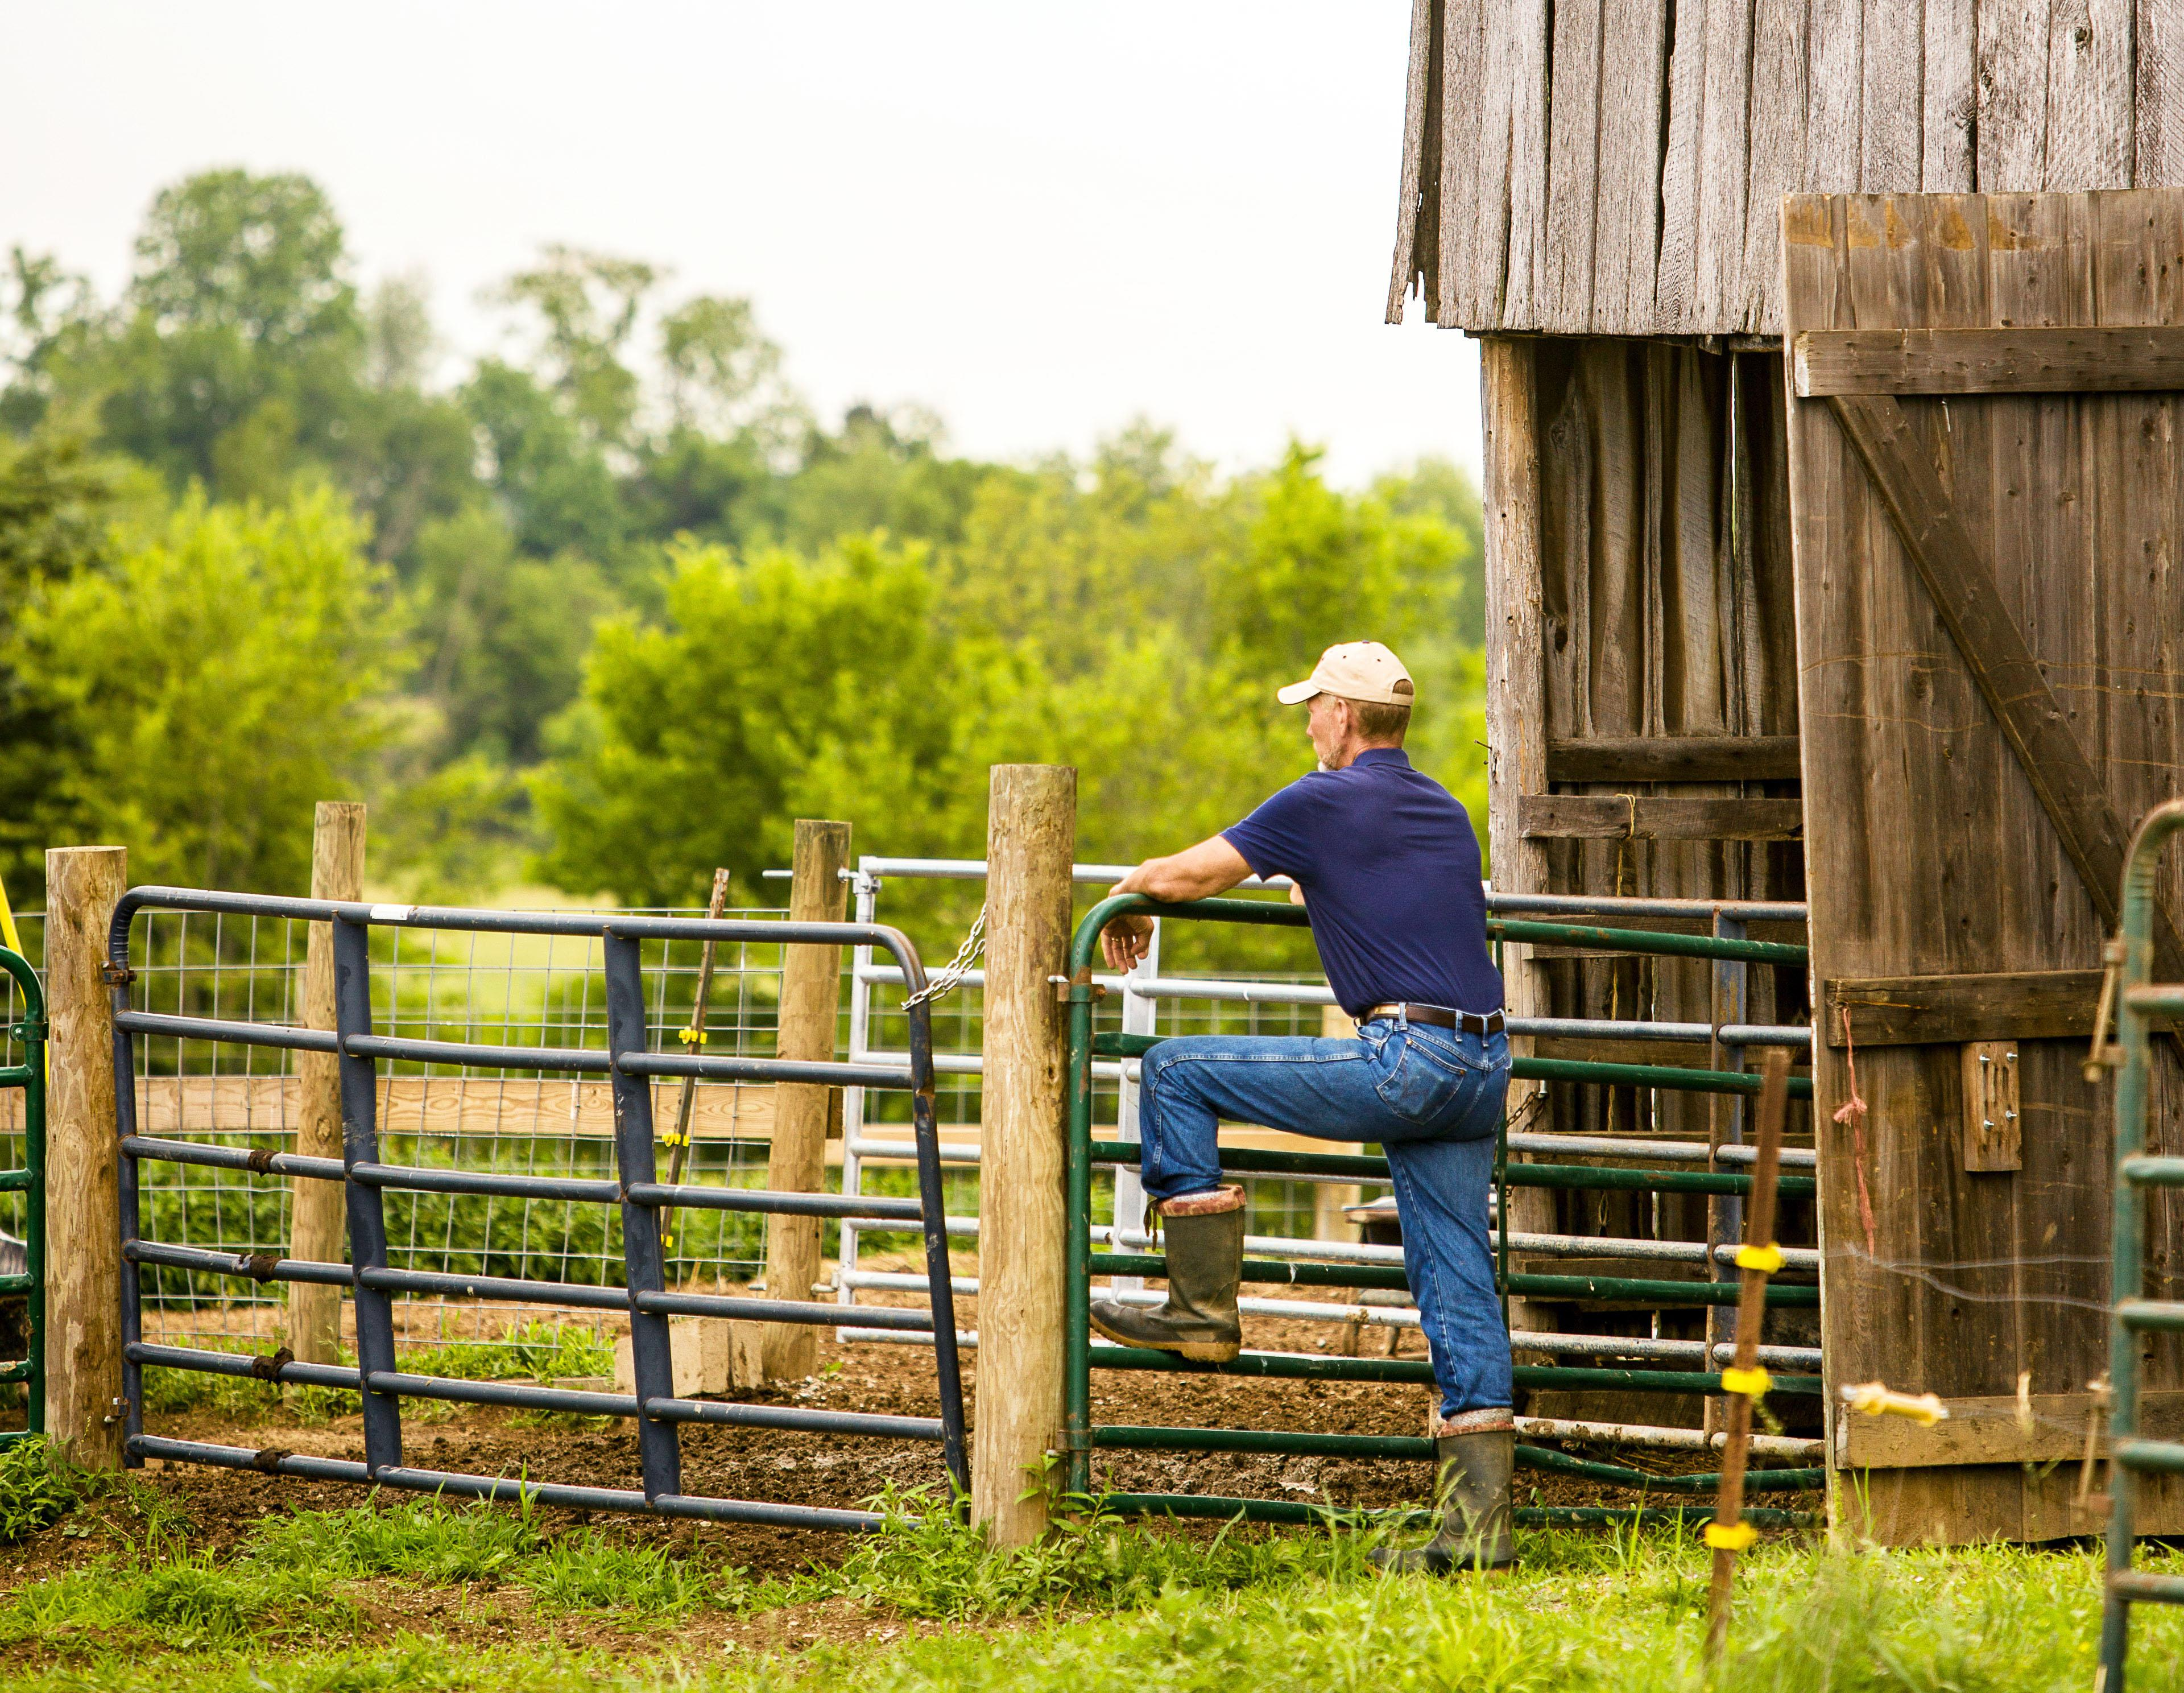 farmer, fence, barn, farm